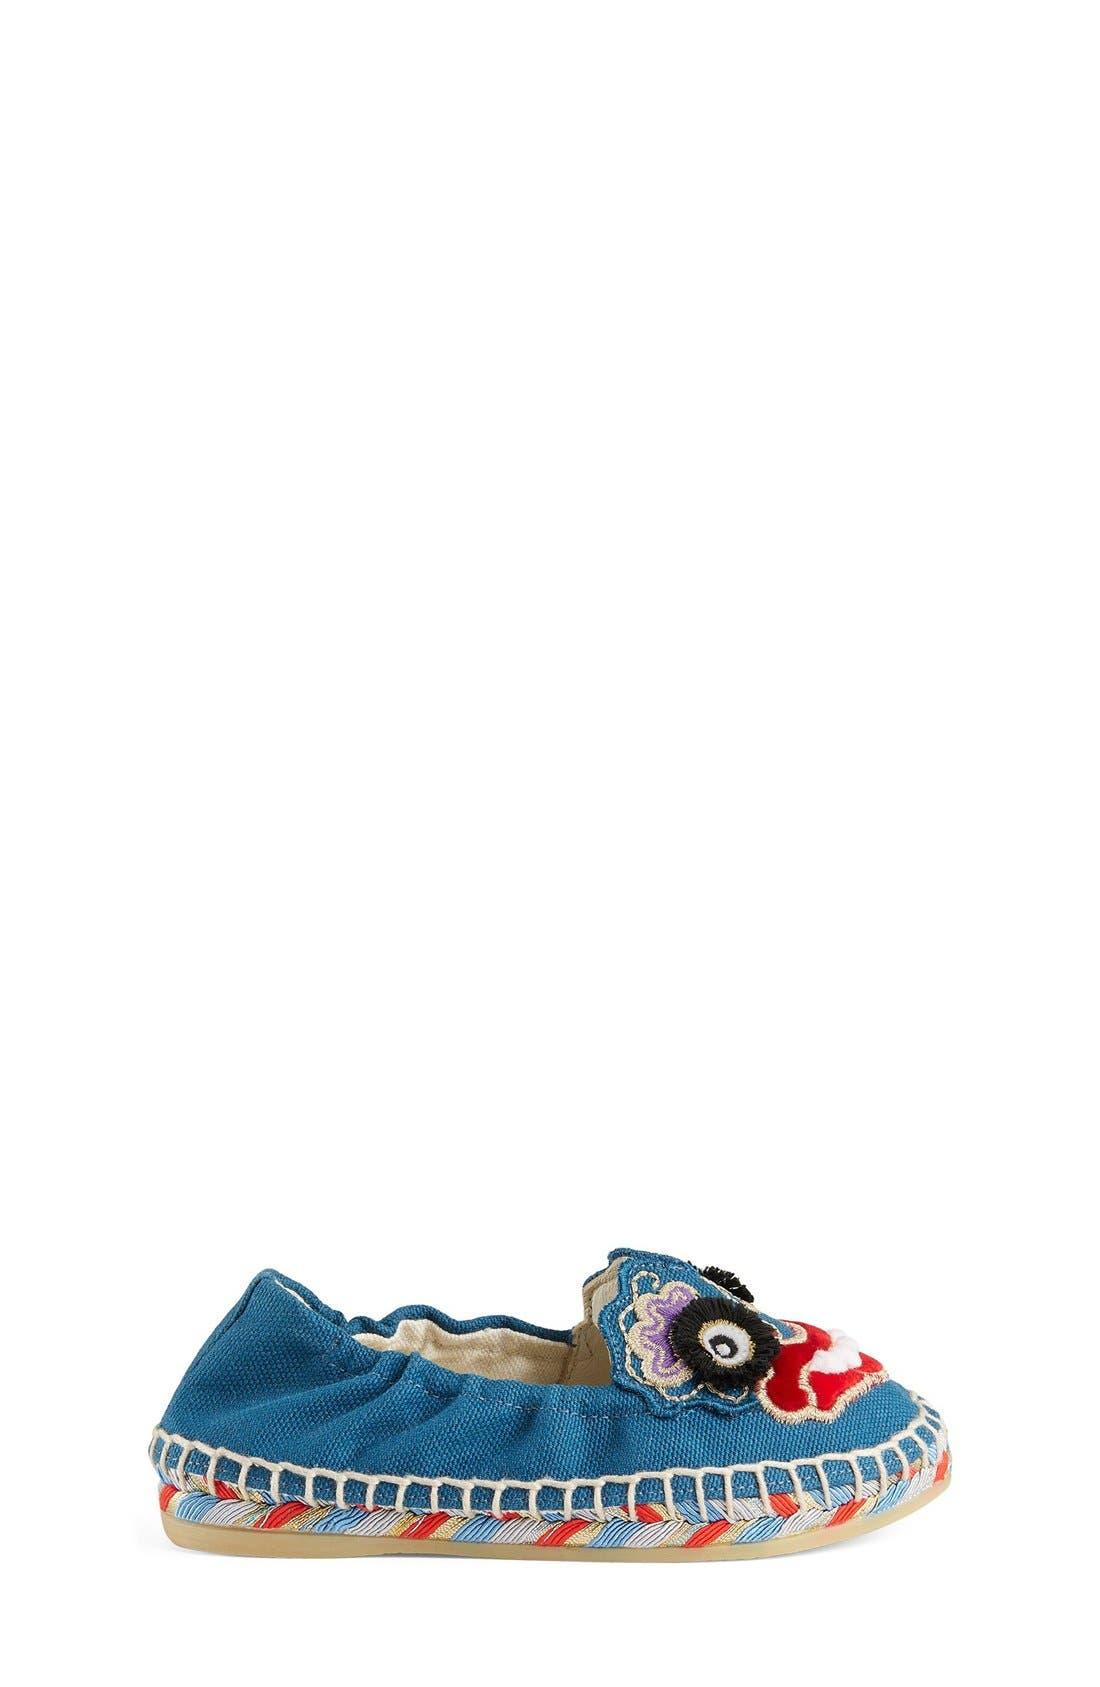 Wen Espadrille Flat,                             Alternate thumbnail 5, color,                             Riviera Blue/ Red